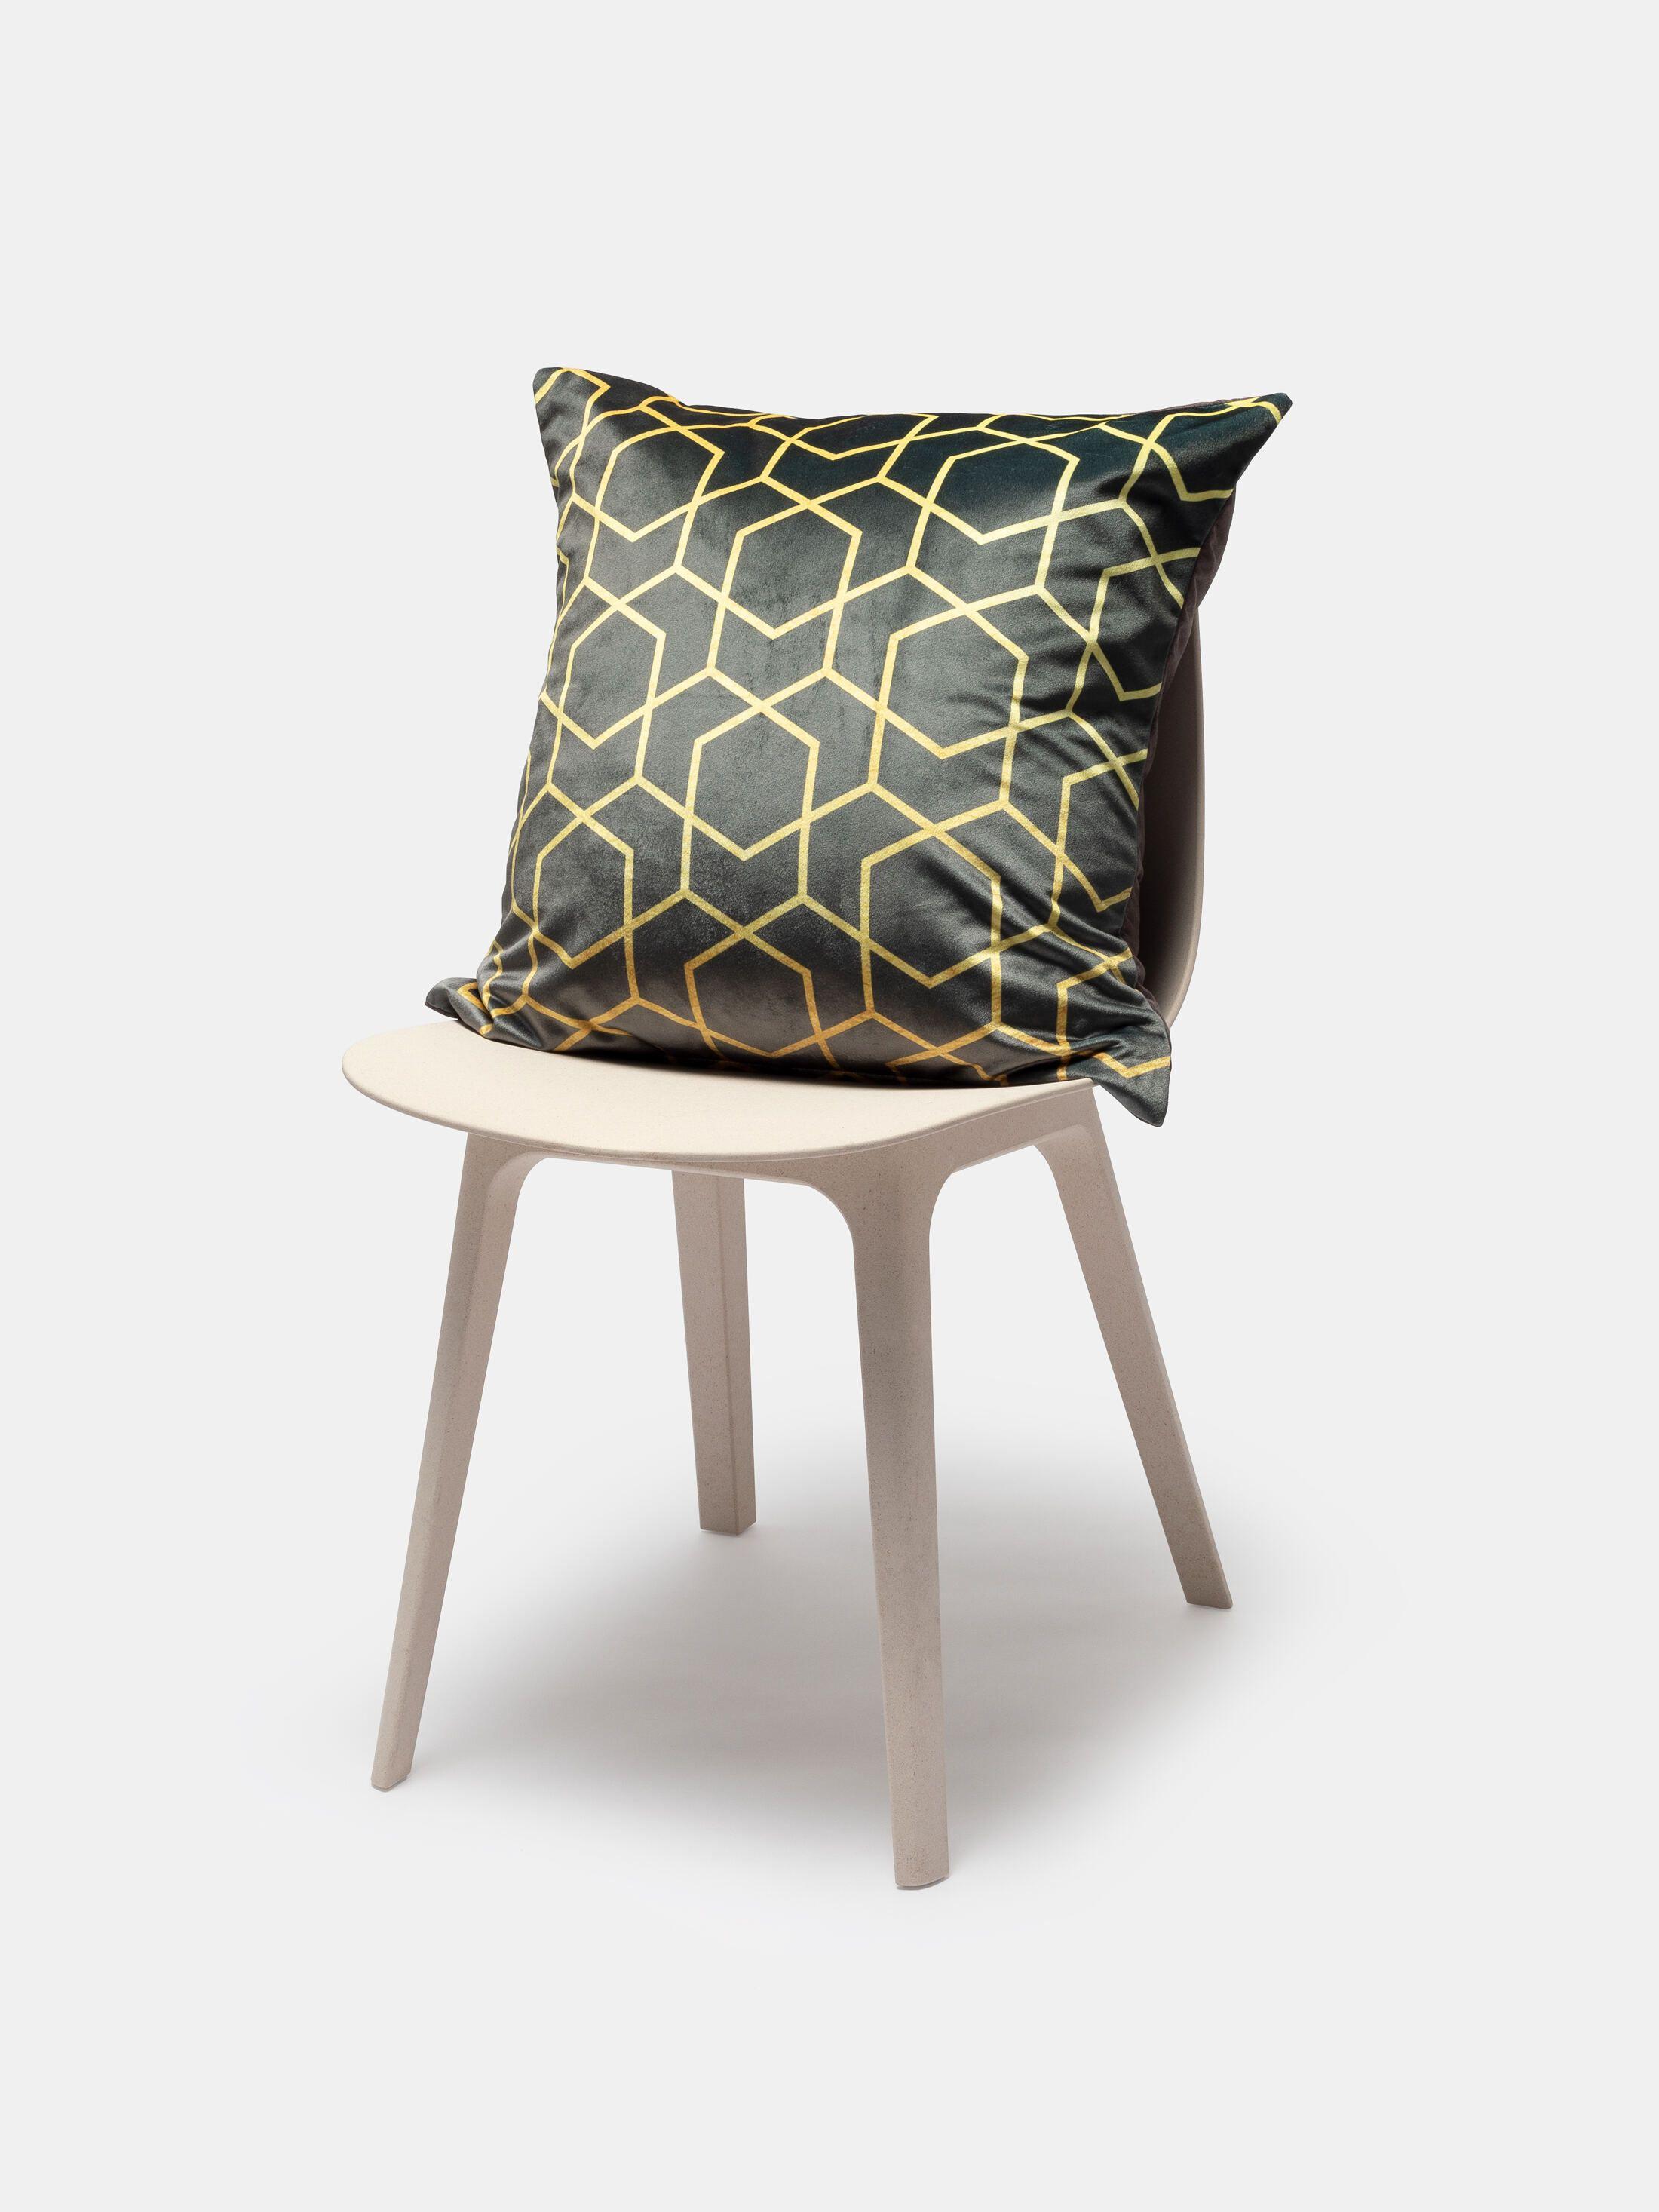 Custom Decorative Cushions in 4 Sizes